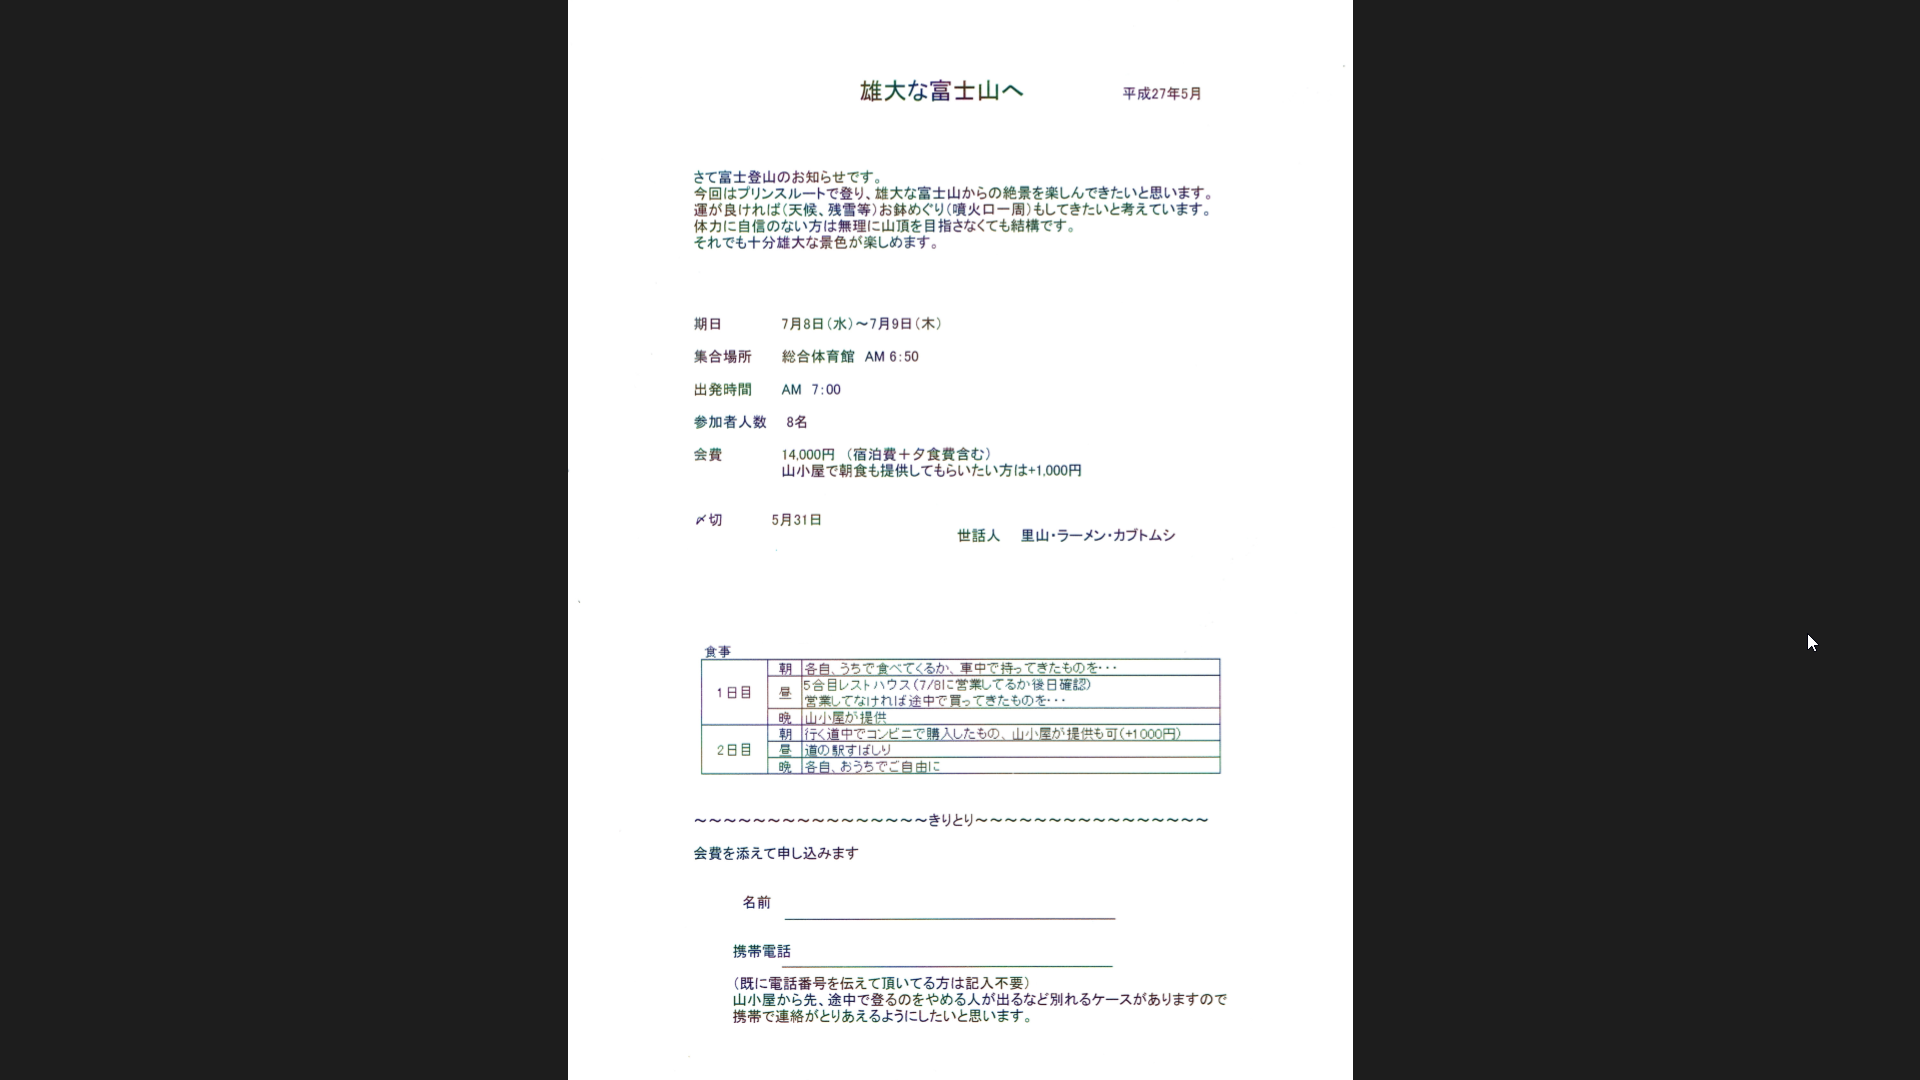 SnapCrab_NoName_2015-5-1_7-13-12_No-00.png